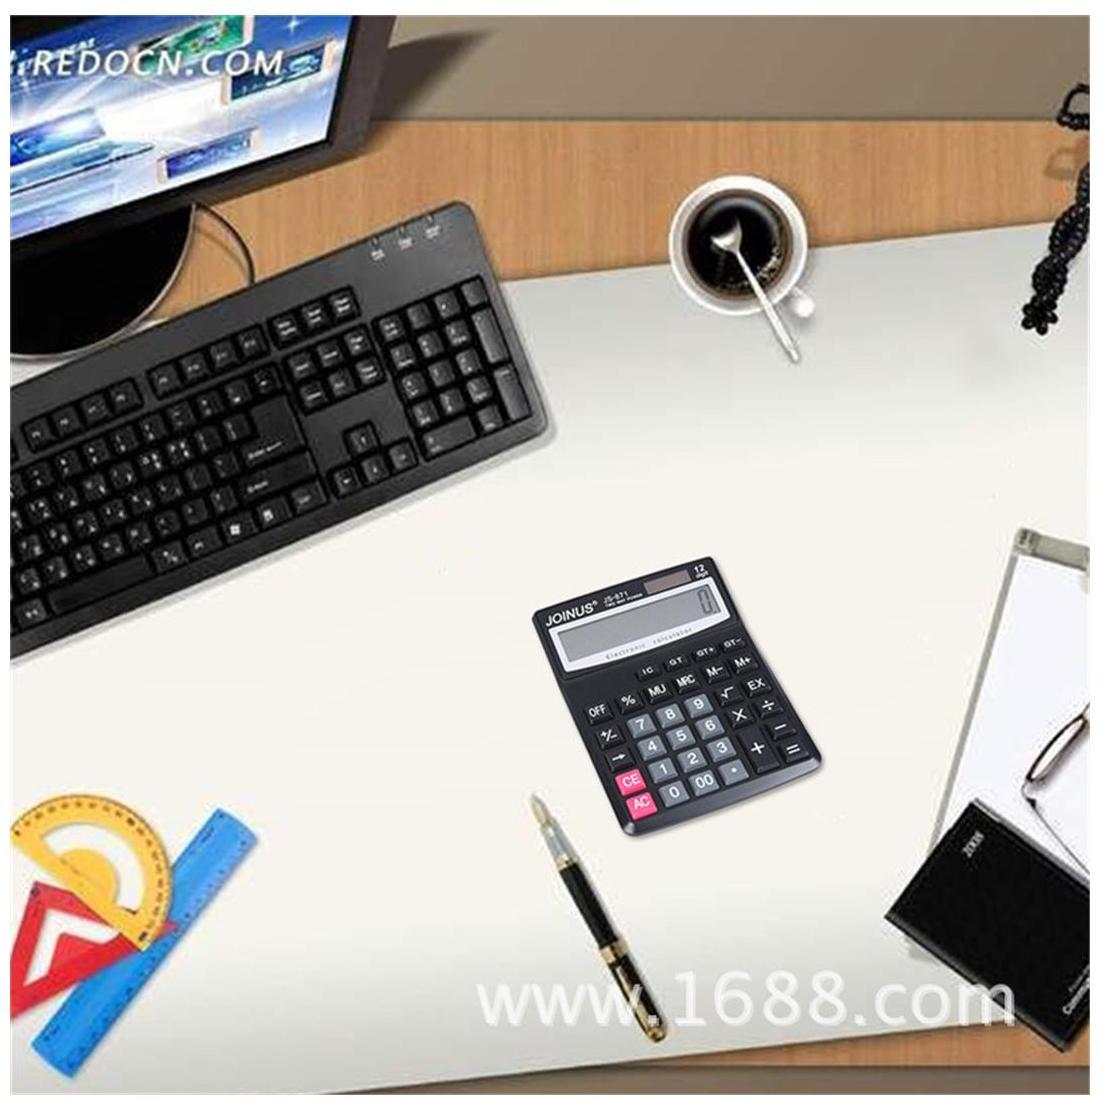 https://assetscdn1.paytm.com/images/catalog/product/S/ST/STA12-DIGIT-LARROND458950ACD981B1/a_0..jpg